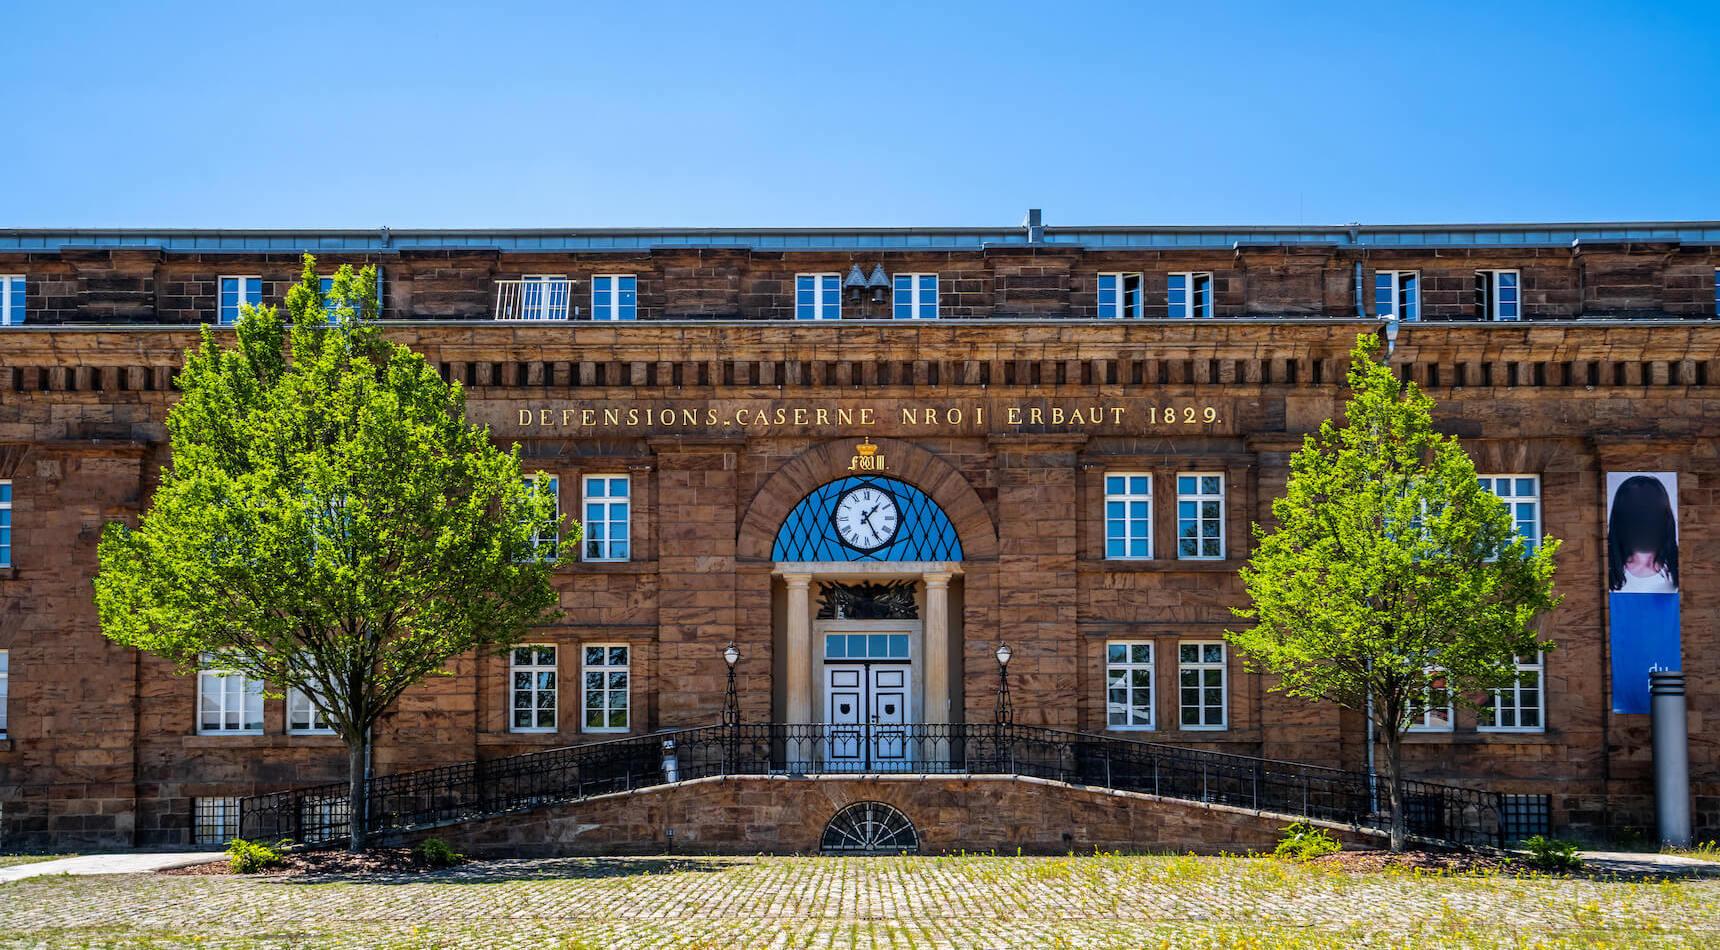 Immobilienmakler Rommelmann in Porta Westfalica im Kreis Minden-Lübbecke